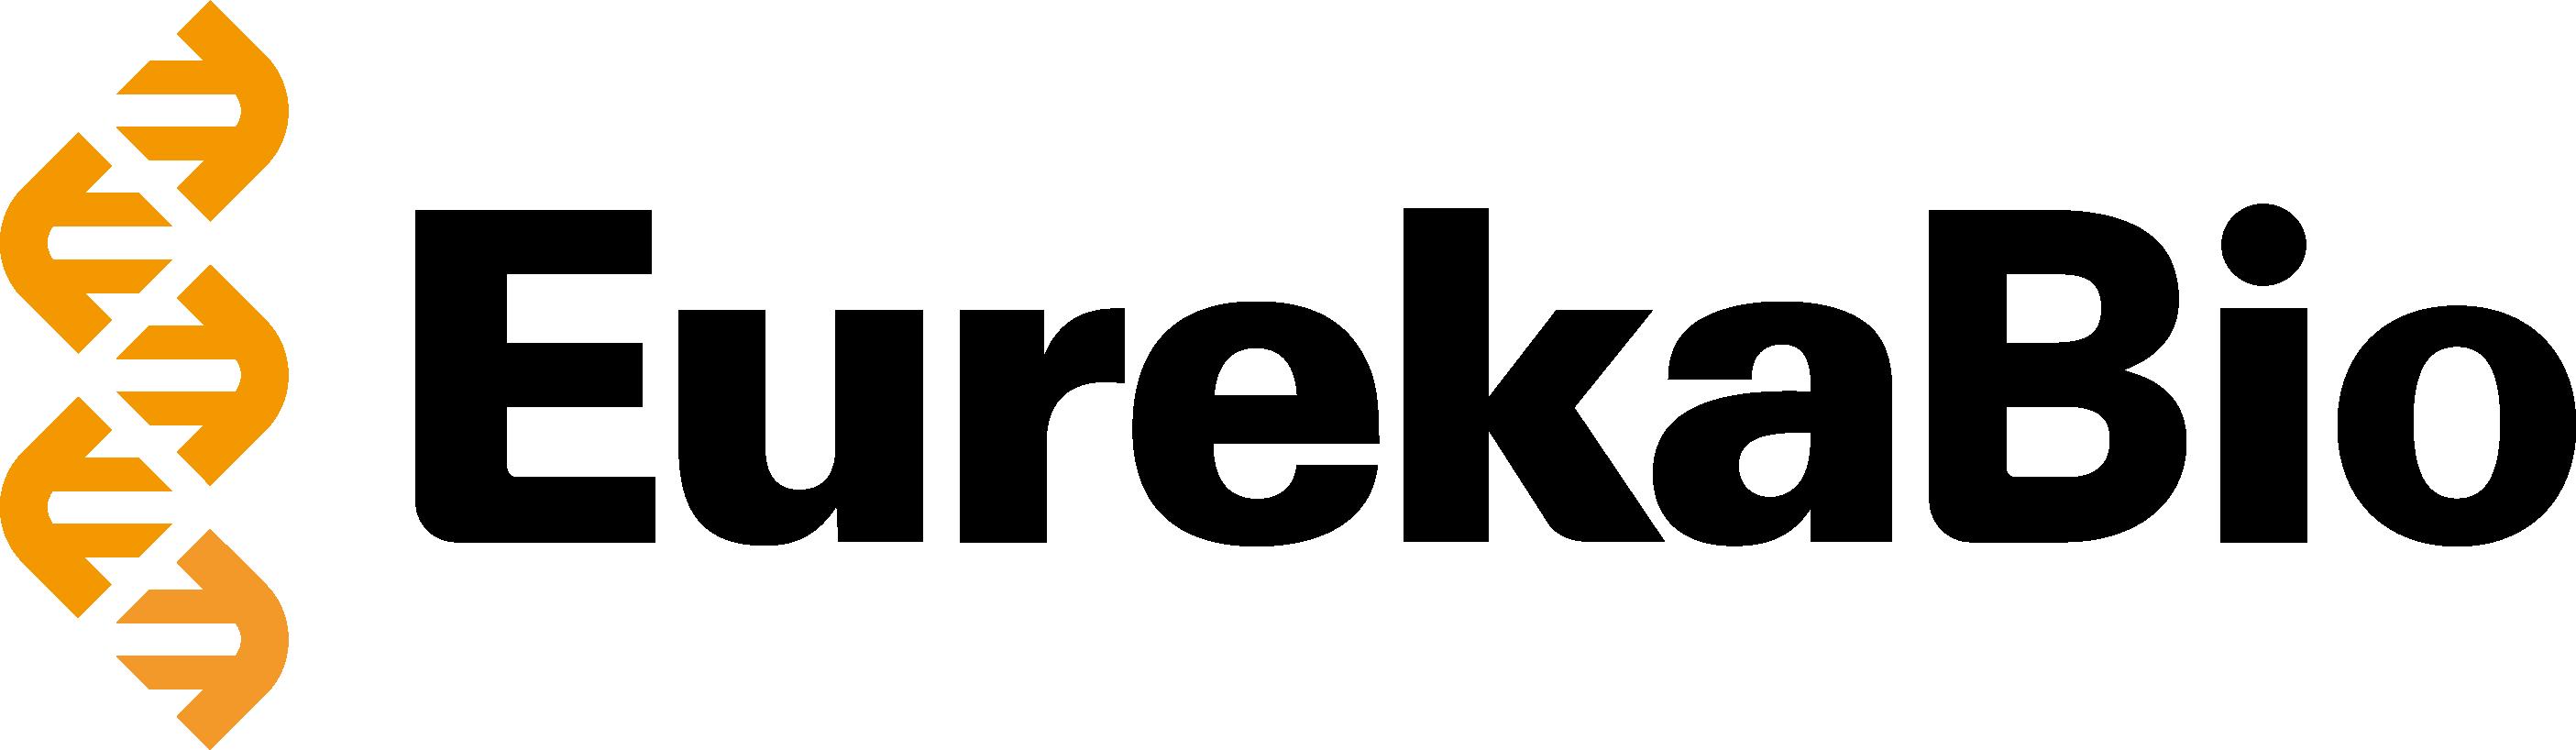 Eurekabio-company logo